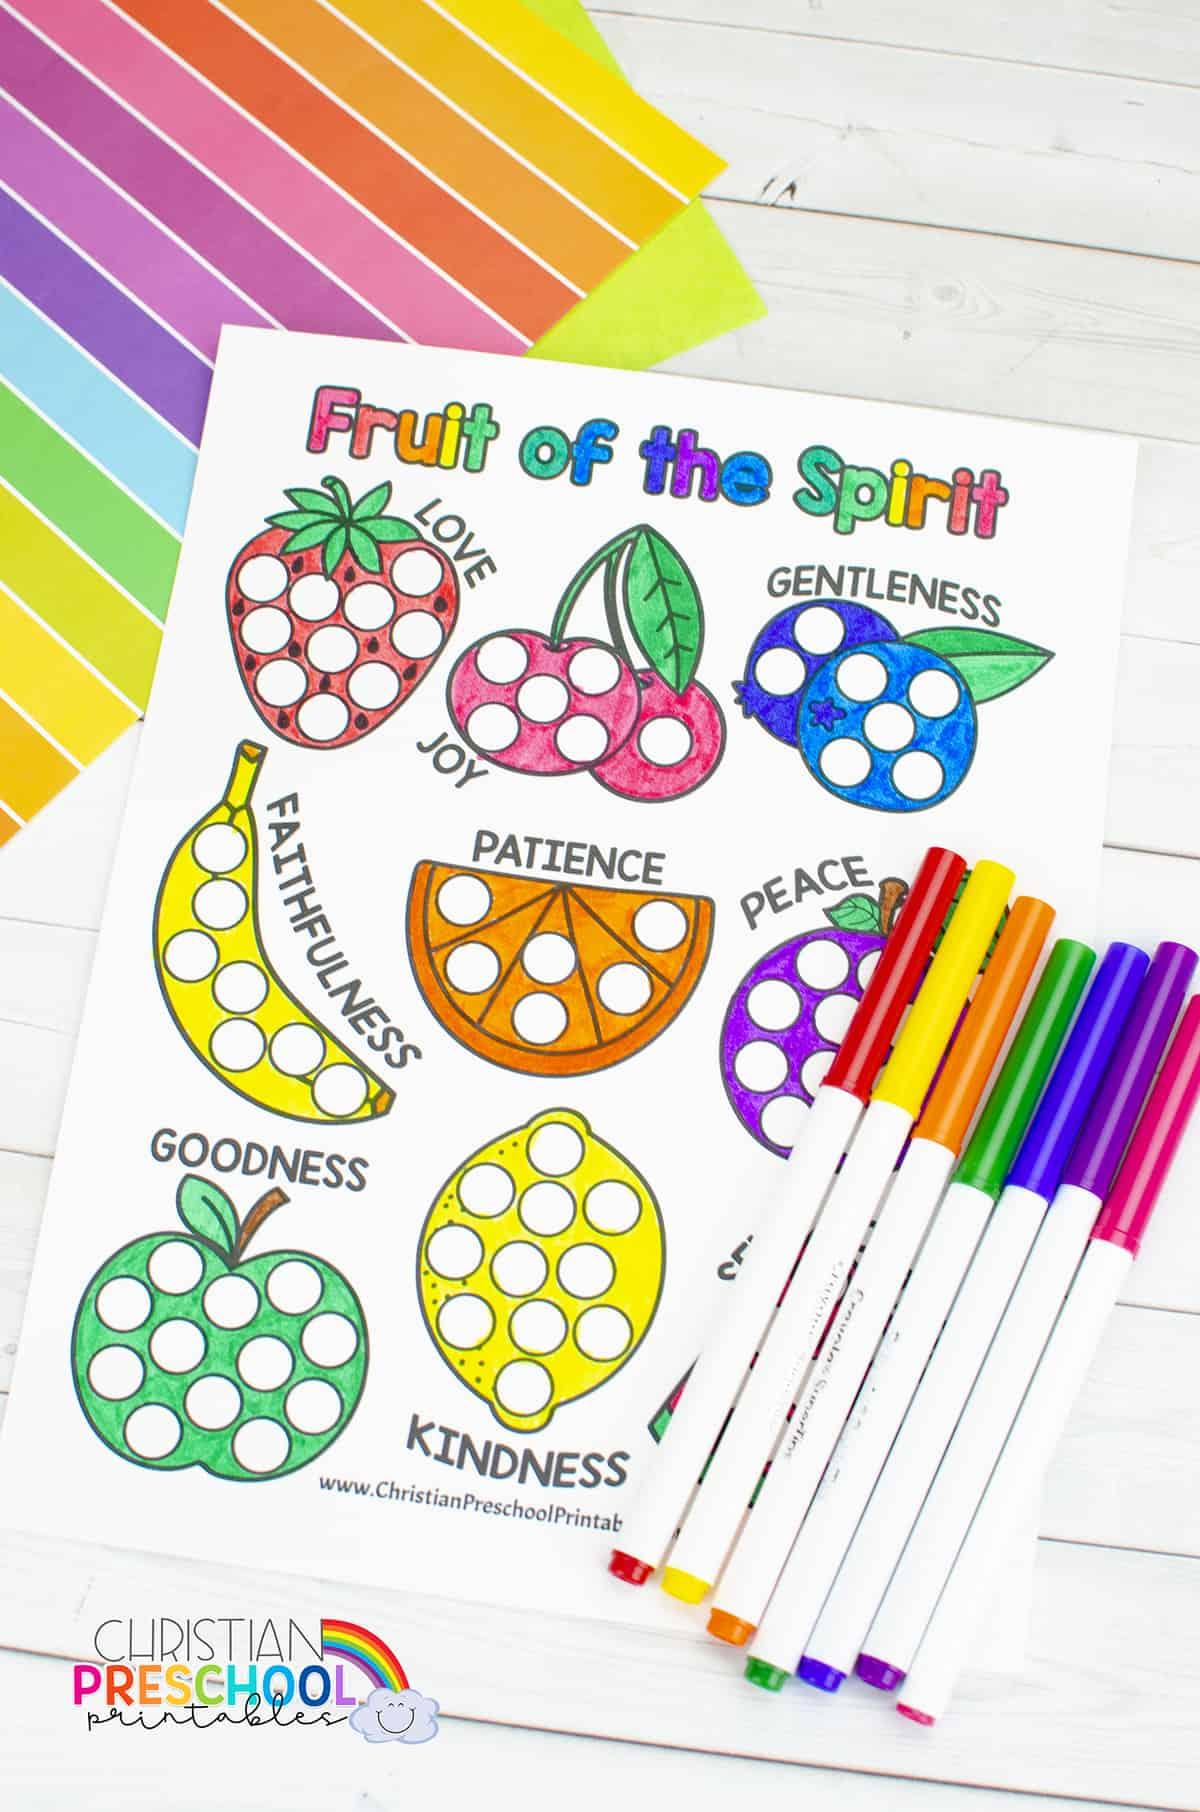 Fruitofhtespiritprintablescoloringpage